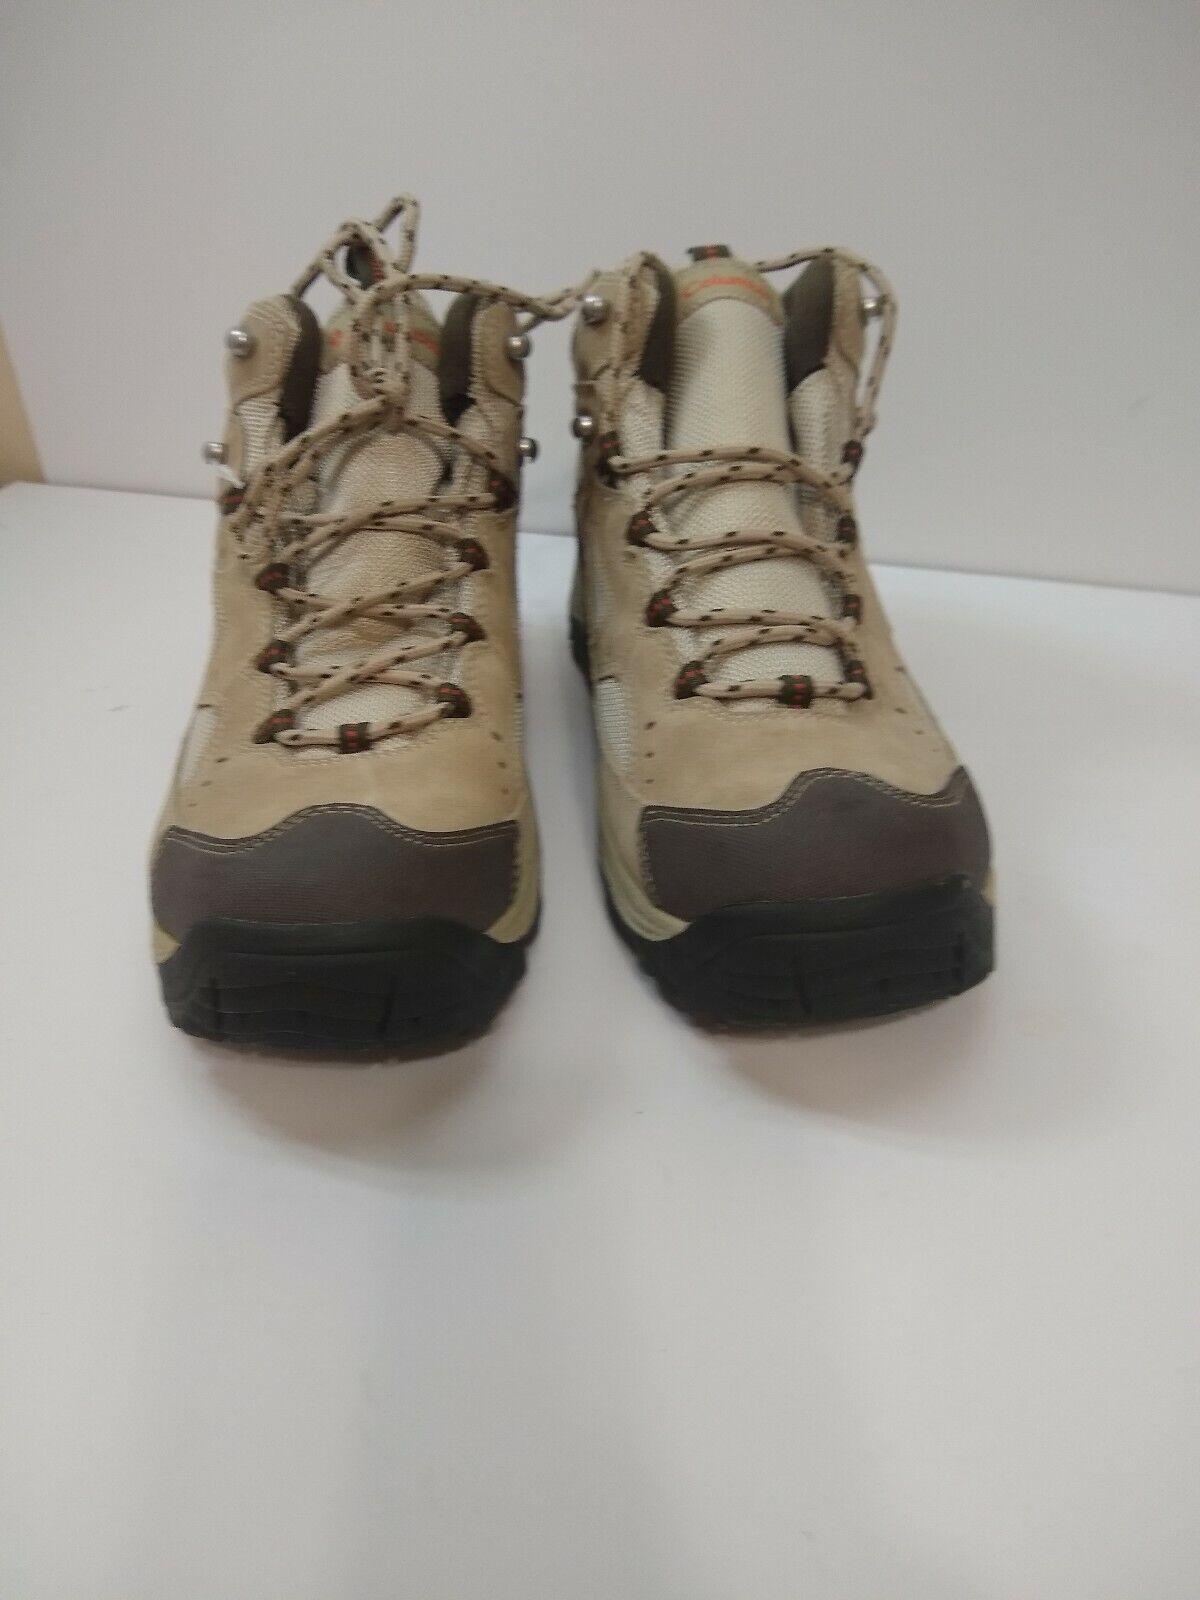 Columbia Men's Newton Ridge Plus Boots, WaterProof Size 10, New